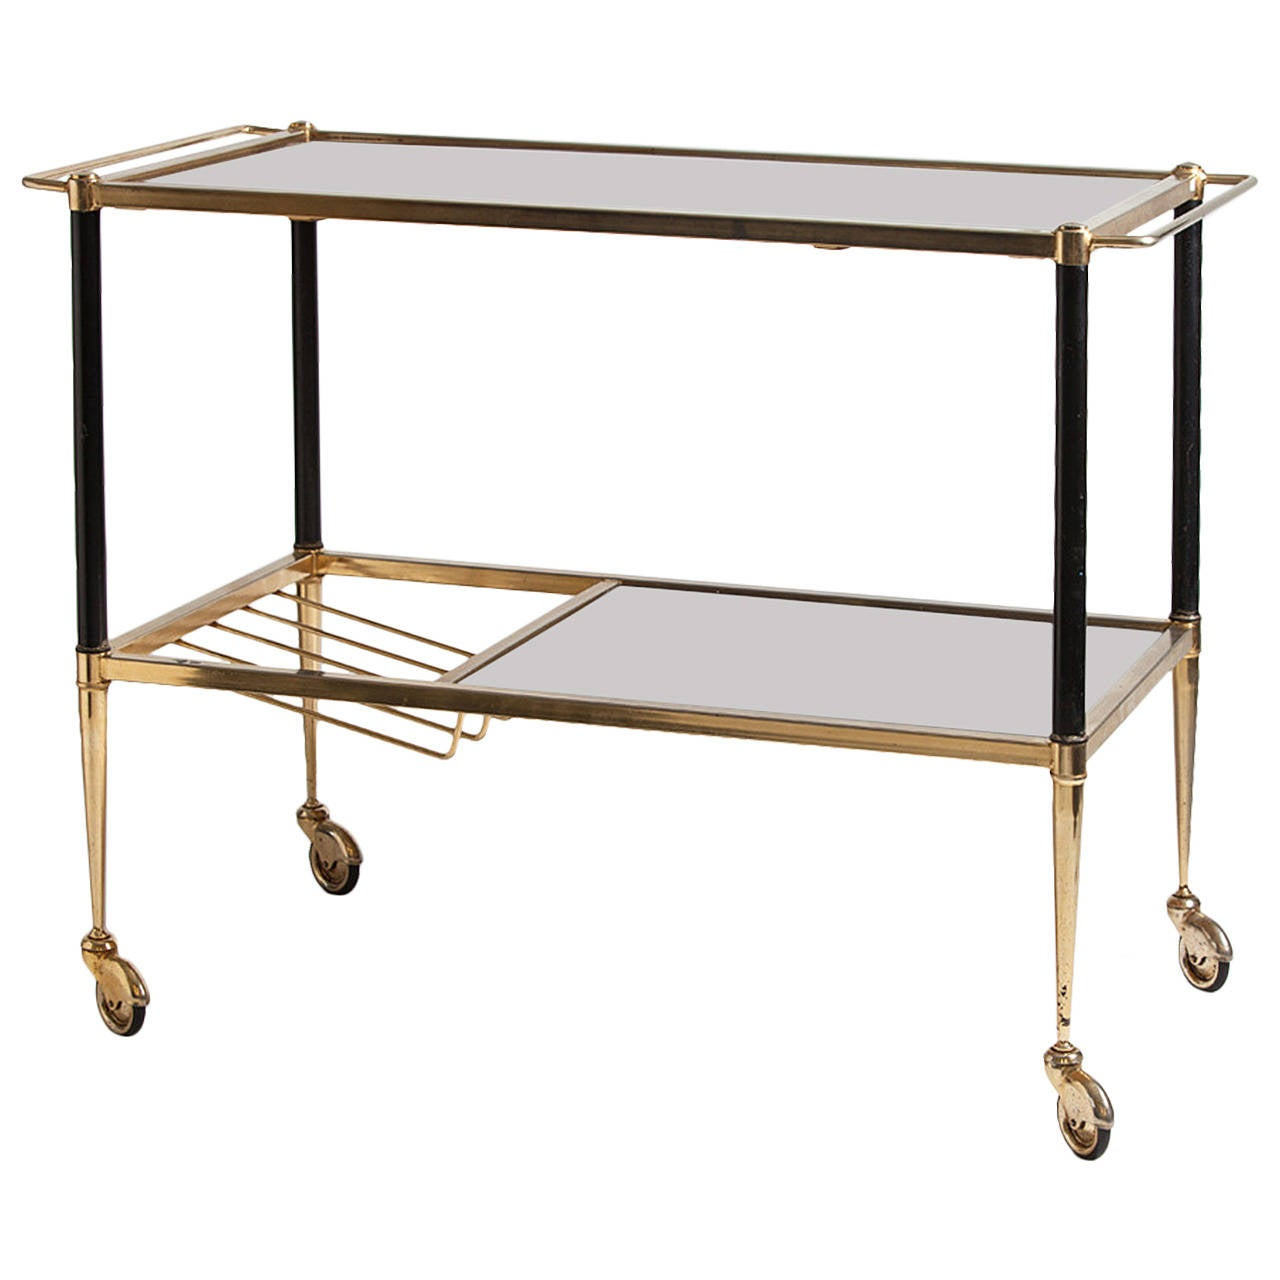 mid century walnut and brass bar cart at 1stdibs. Black Bedroom Furniture Sets. Home Design Ideas